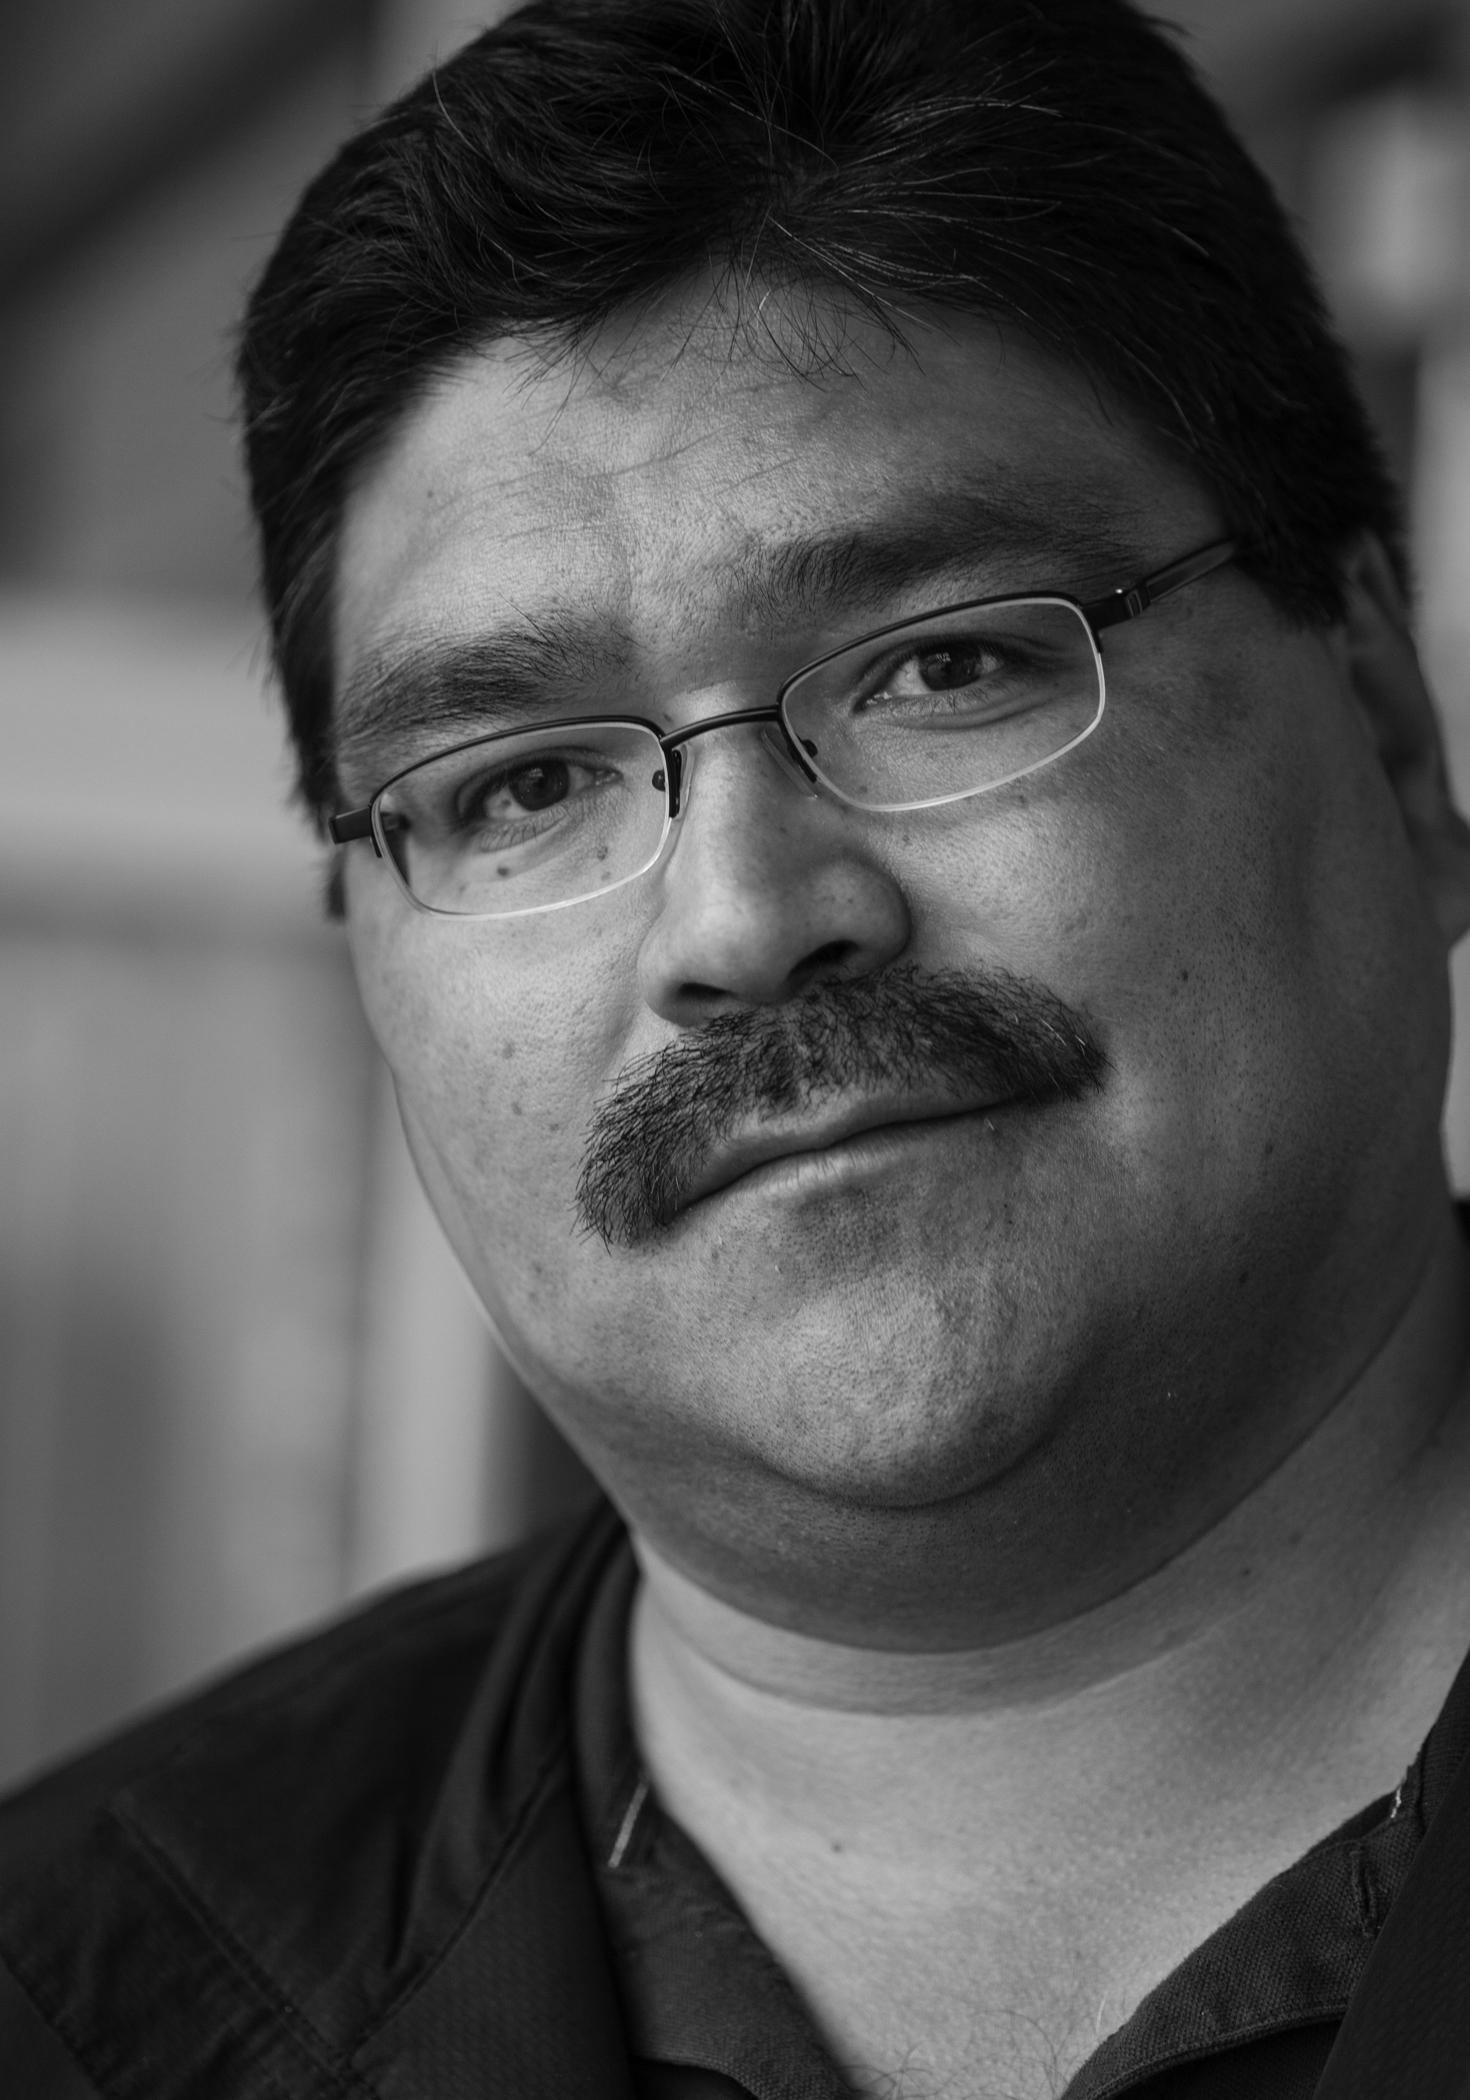 KCA-015 Ki-tah-pah-tumak aski ethinewak [keeper of the land] Leslie, O-Pipon-Na-Piwin Cree Nation, 2016, AP.jpg